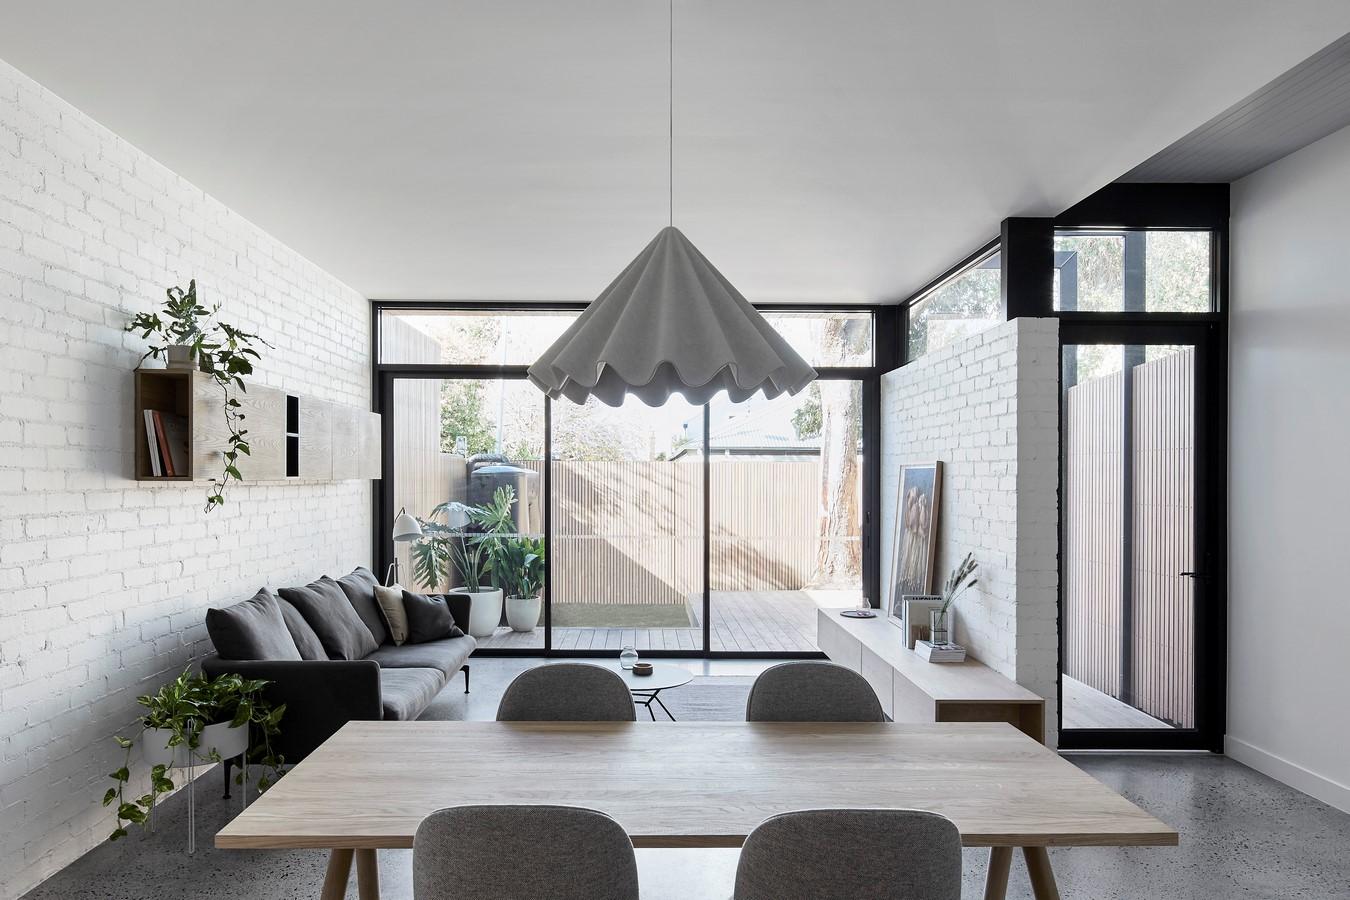 Loft House by Tom Robertson Architects - Sheet1